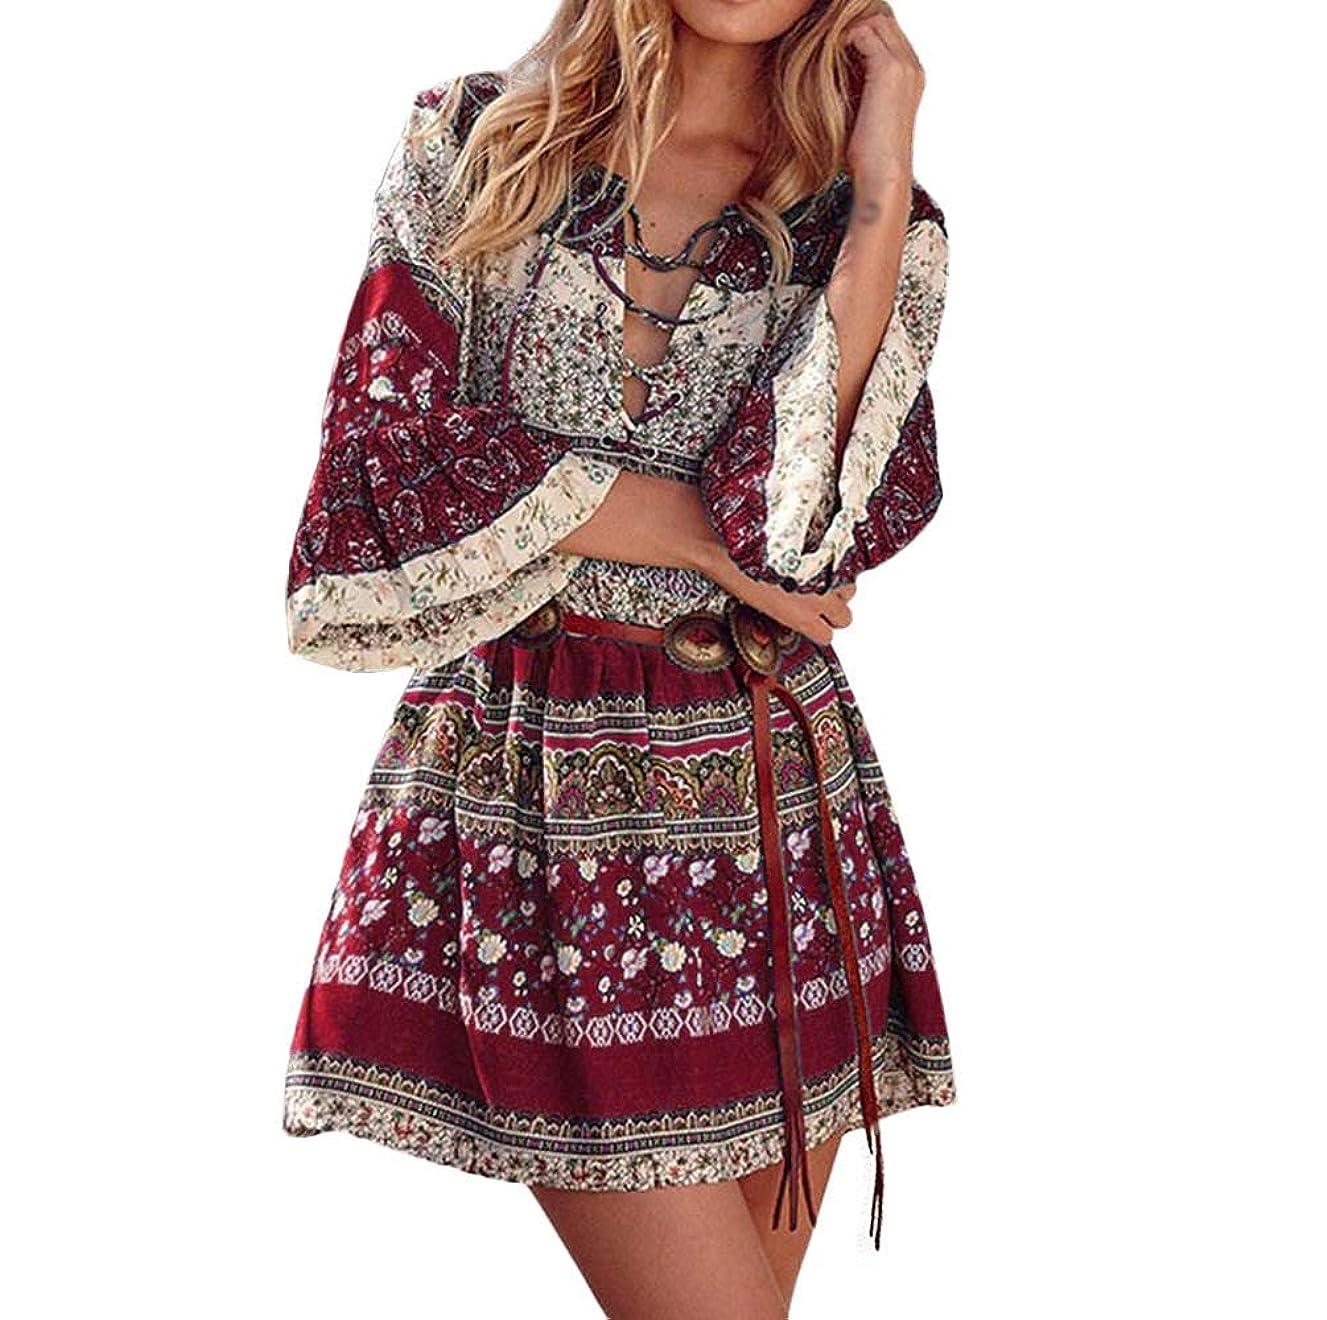 Women's Floral Print Dress Boho Long Sleevees Dress Casual Evening Party Dress